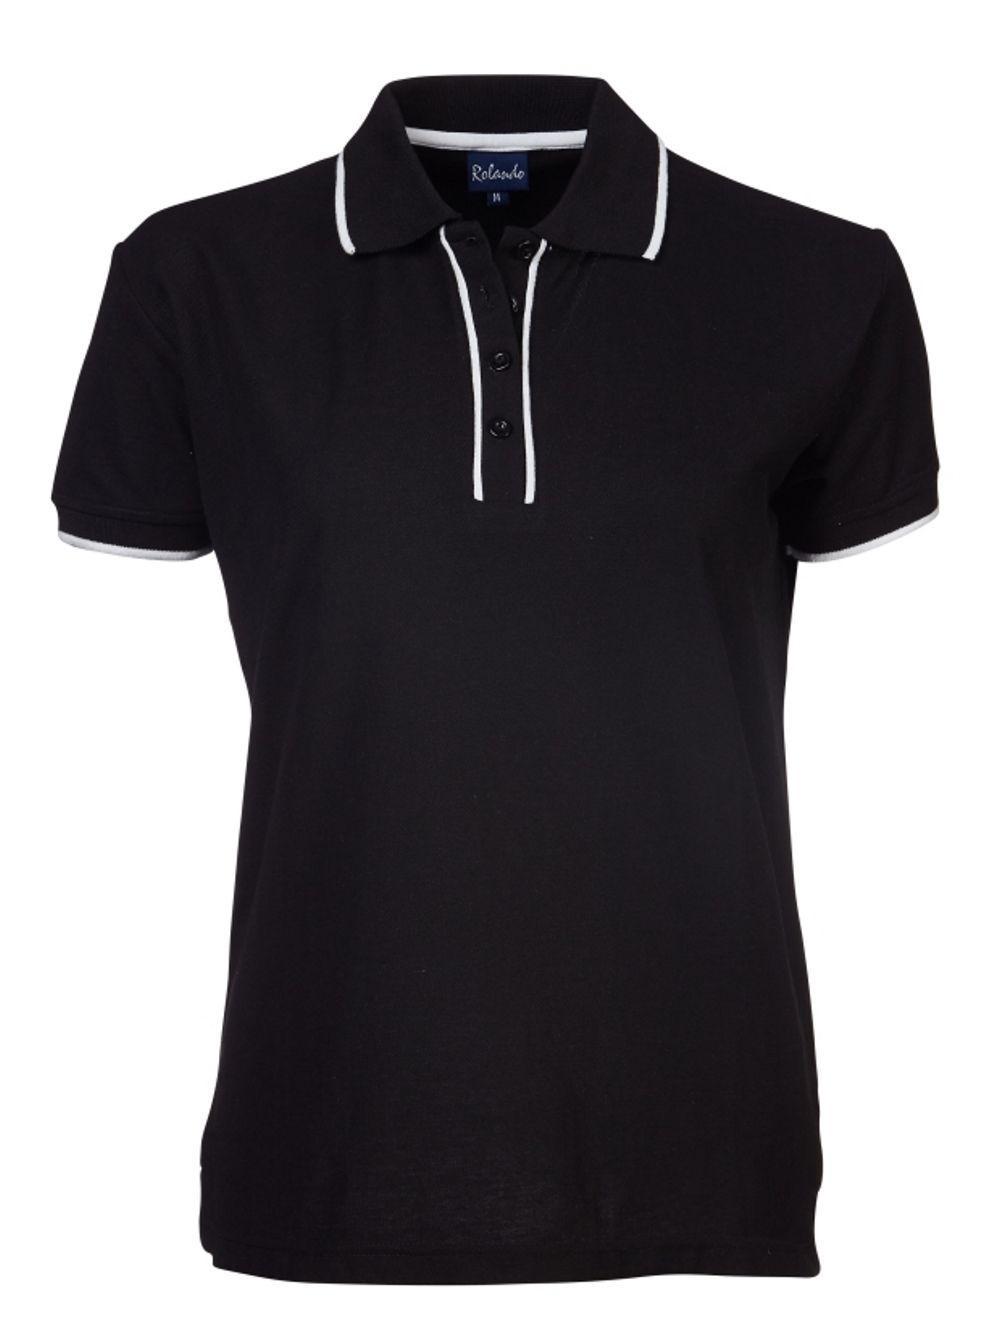 Ladies Arabella Golfer - Black/white